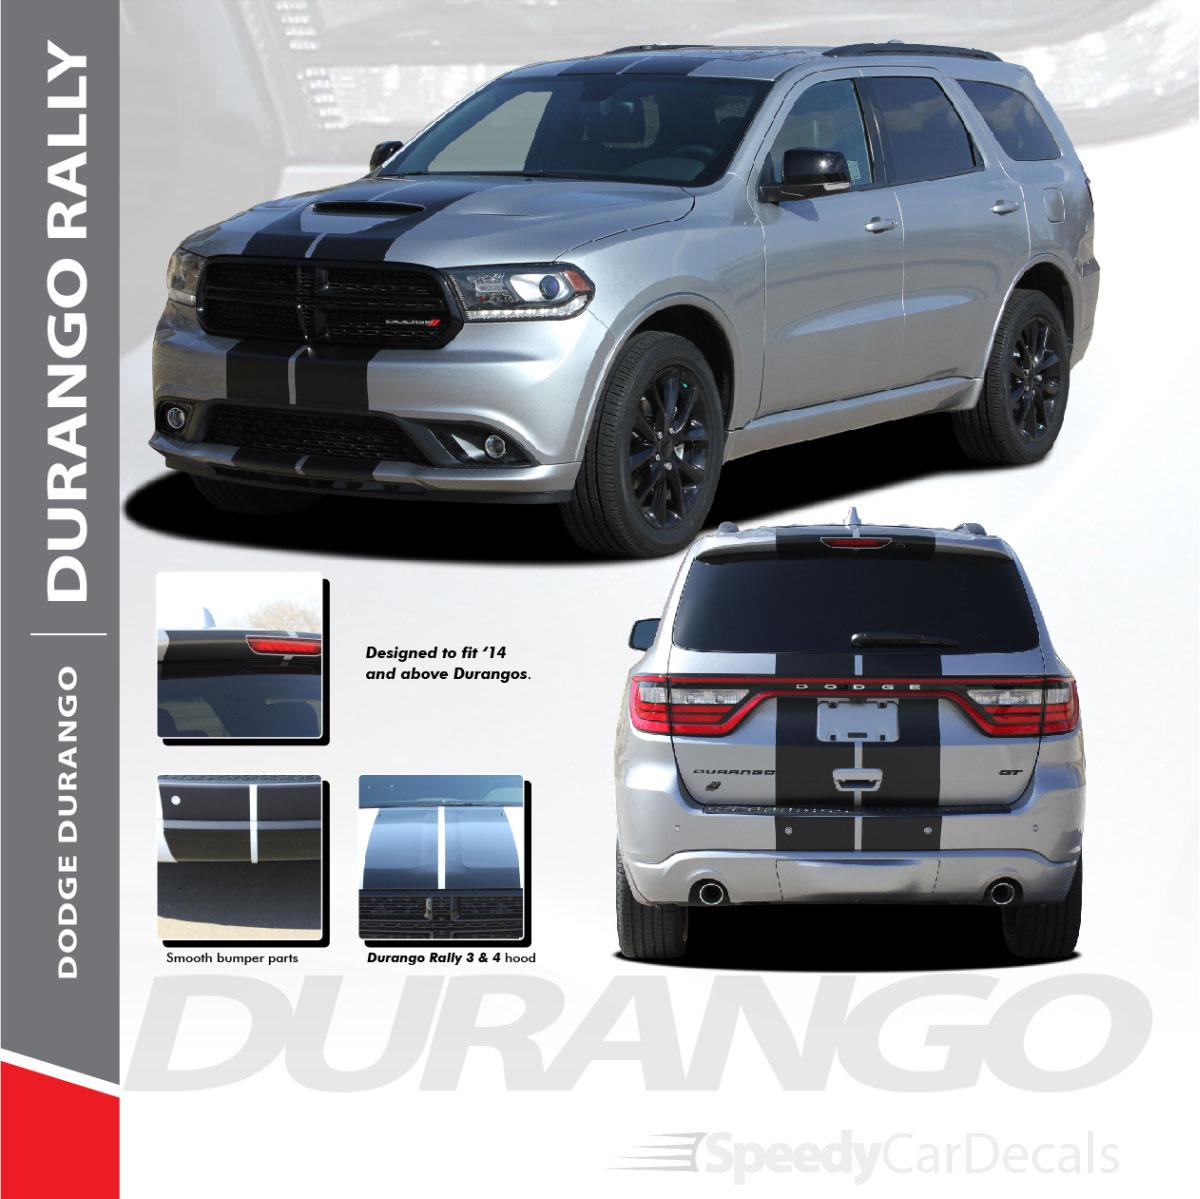 2019 Dodge Durango Srt Graphics Durango Rally 2014 2020 3m Premium Wet Install